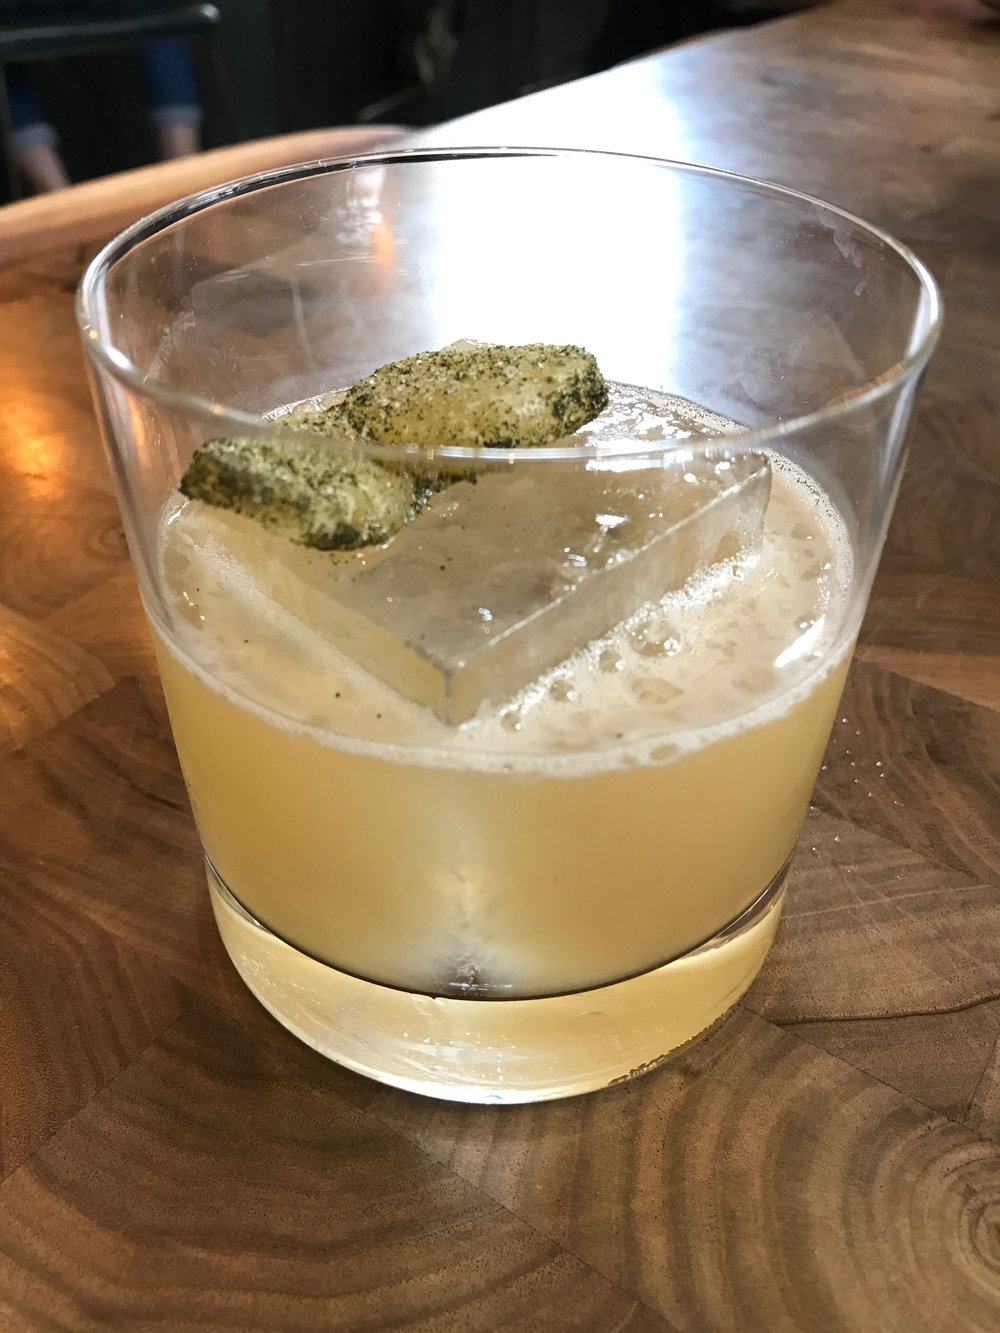 A delicious yuzu cocktail